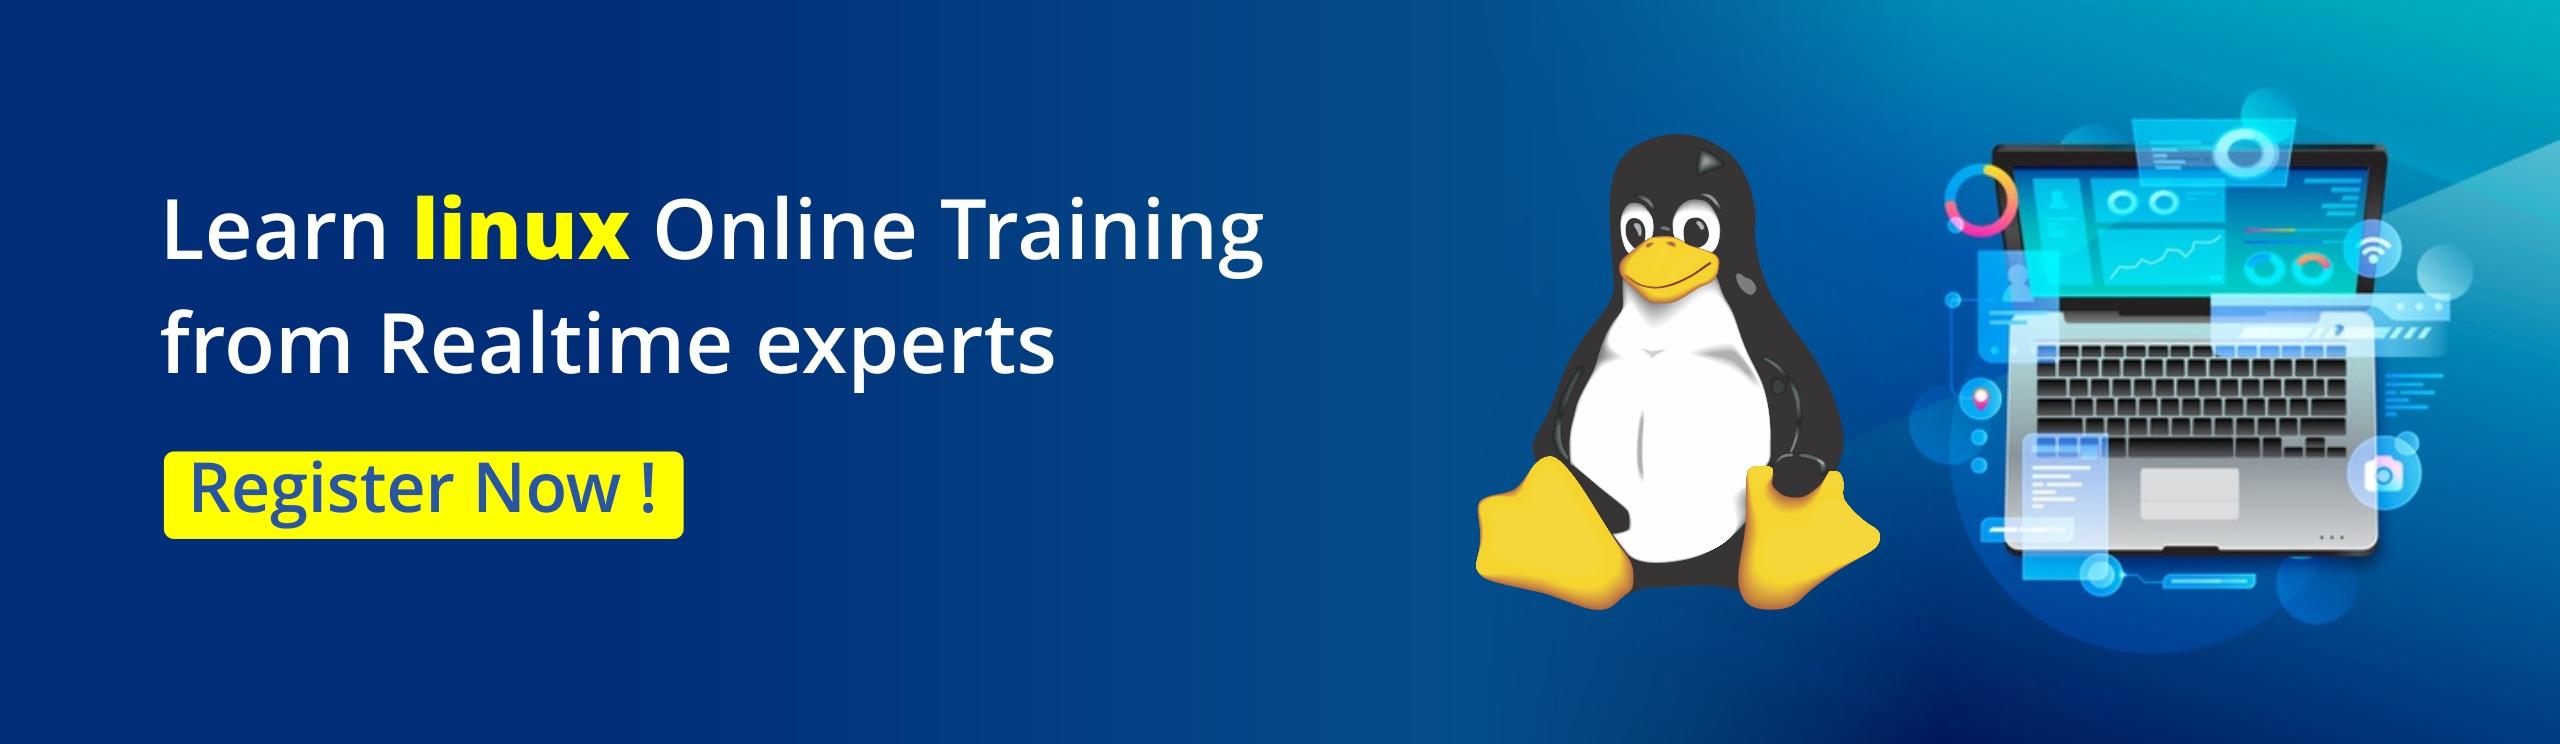 Linux Online Training - NareshIT